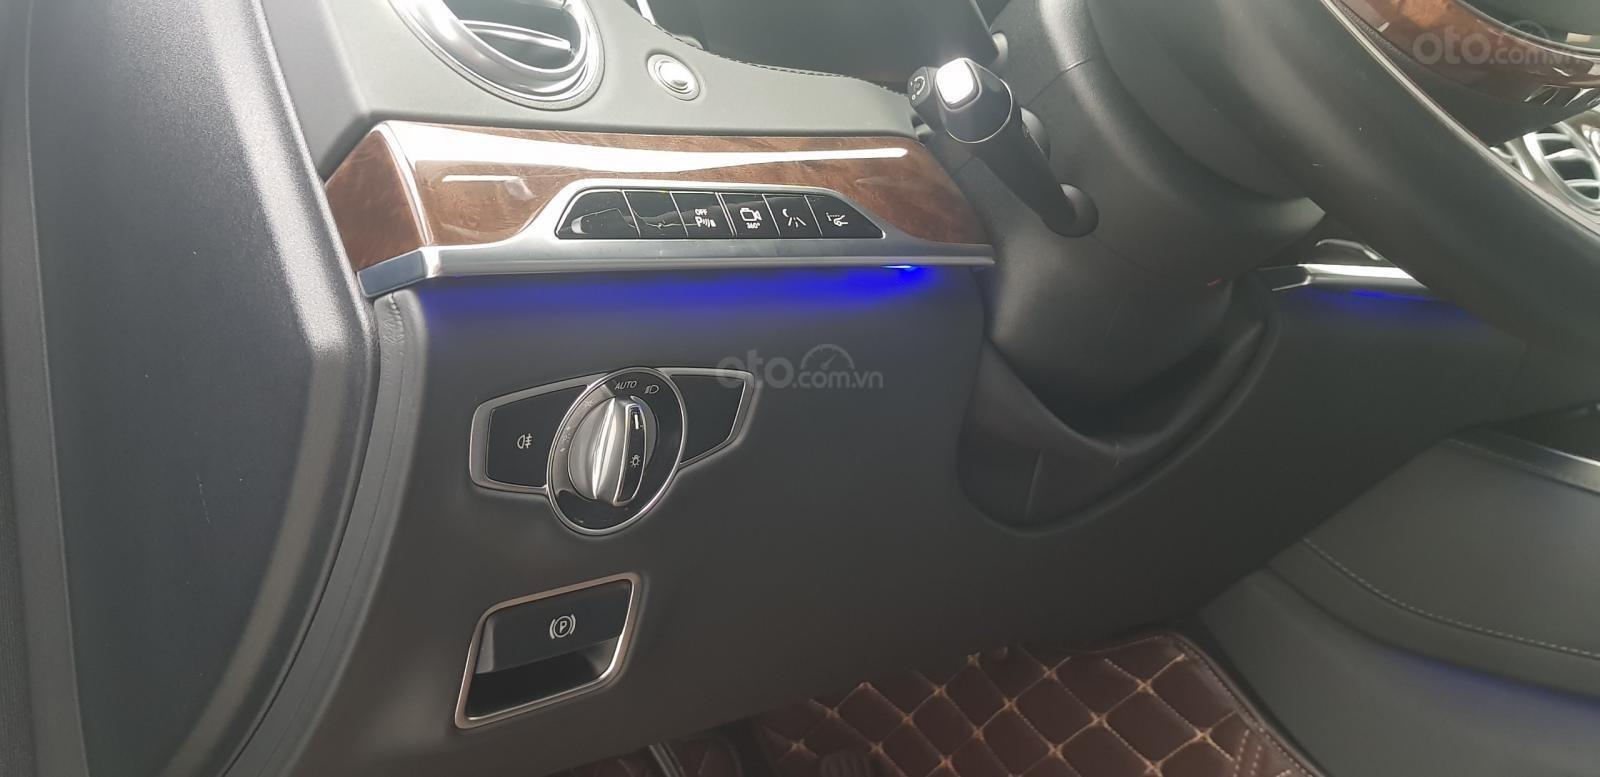 Bán Mercedes-Benz S500 SX 2016 màu đen, LH Ms  Hương 094.539.2468 (4)